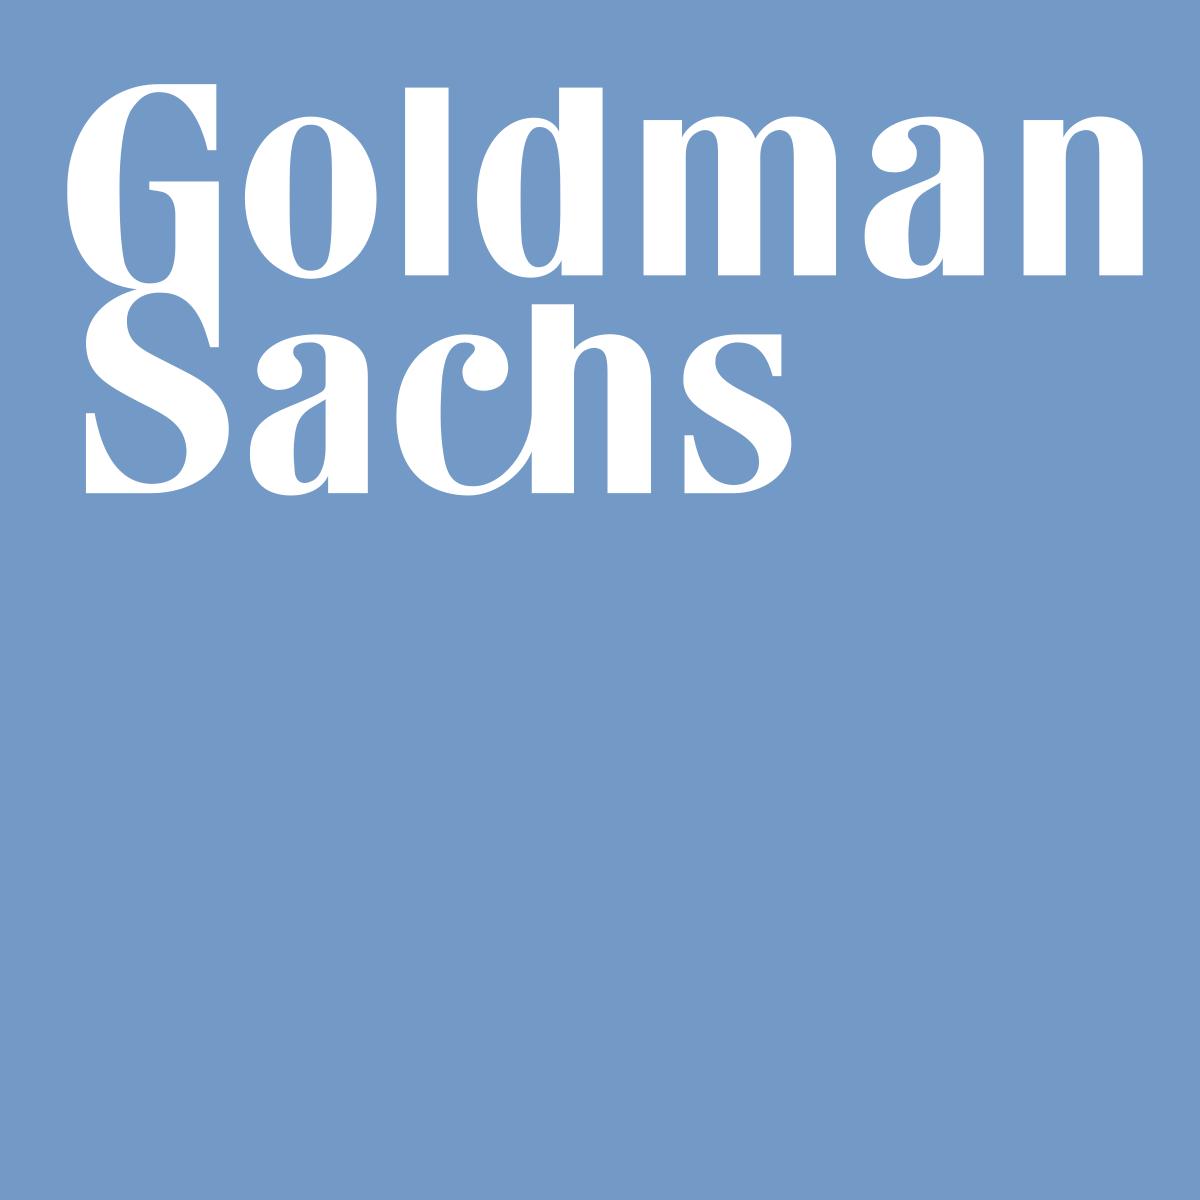 Goldman Sachs Santa Cruz, CA Nexus Wealth Advisors